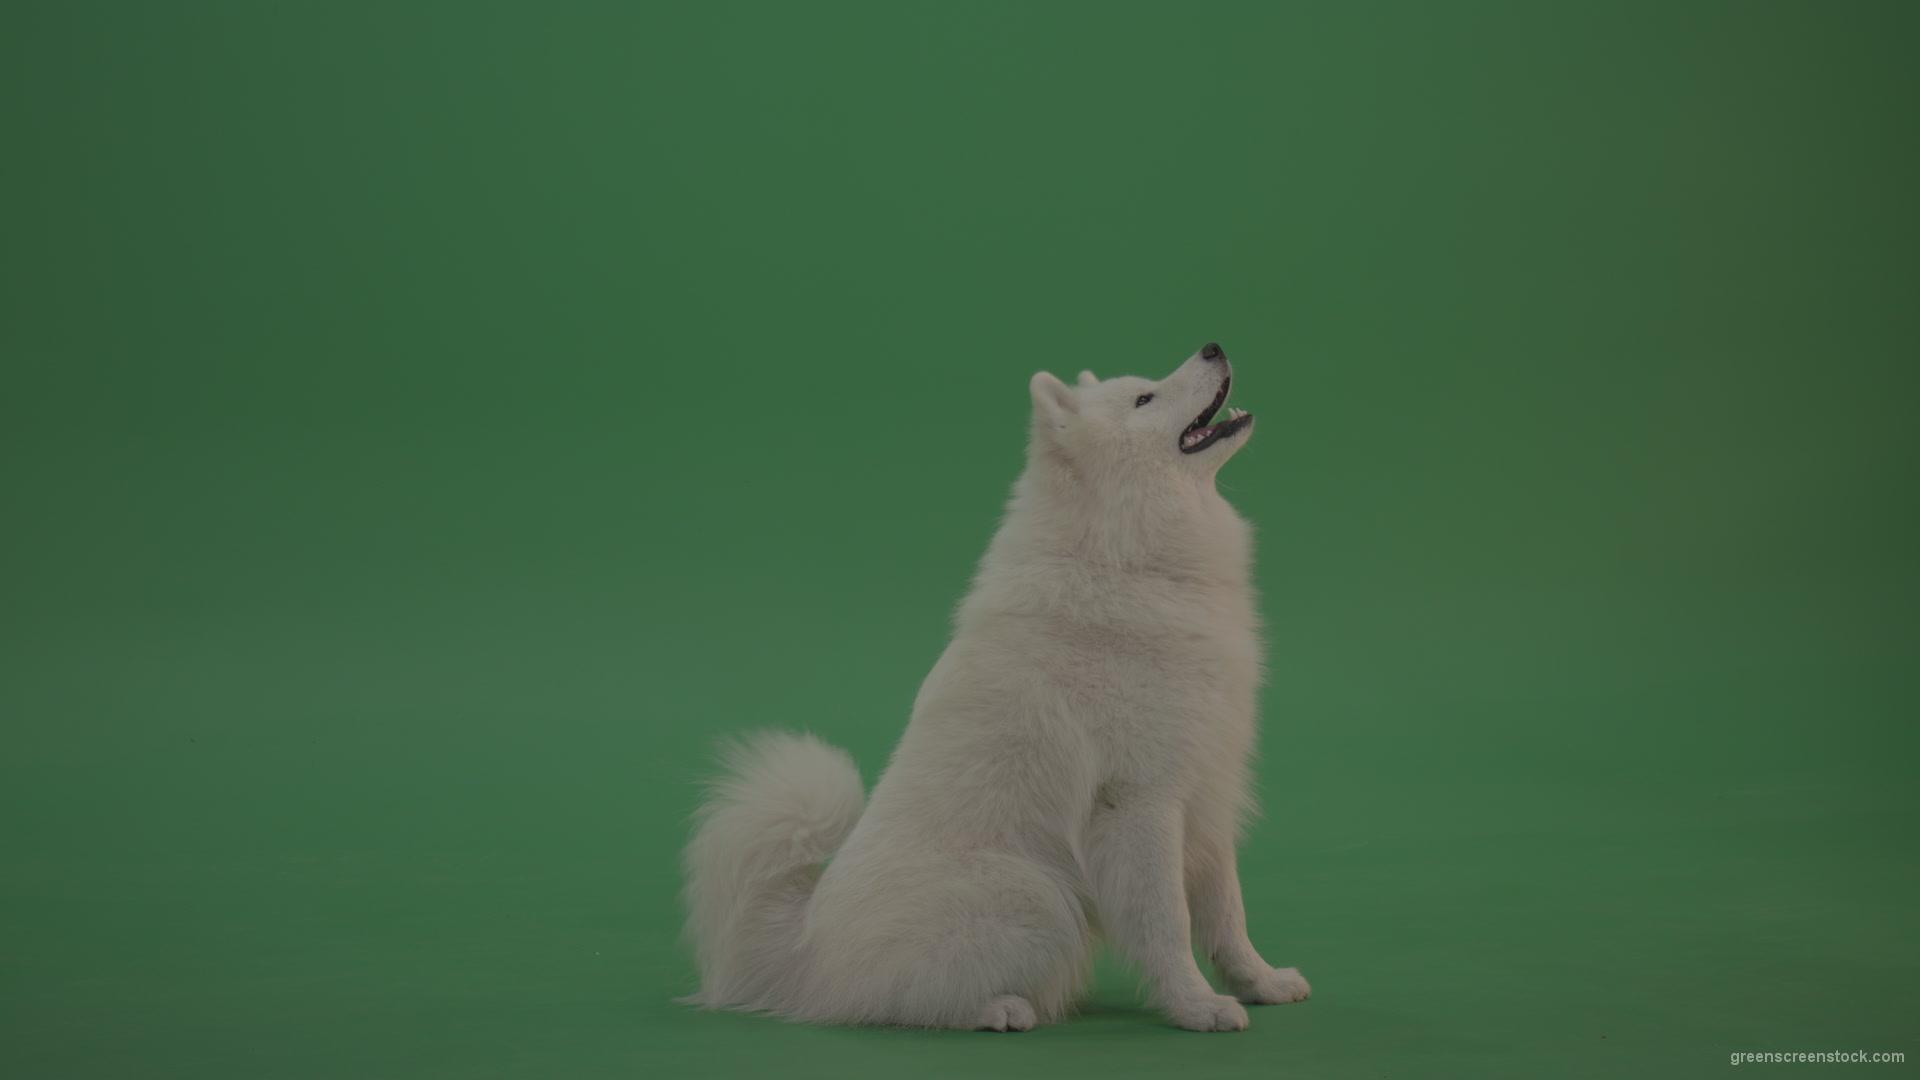 Digital Picture Image Photo Wallpaper JPEG Dog Desktop Screensaver